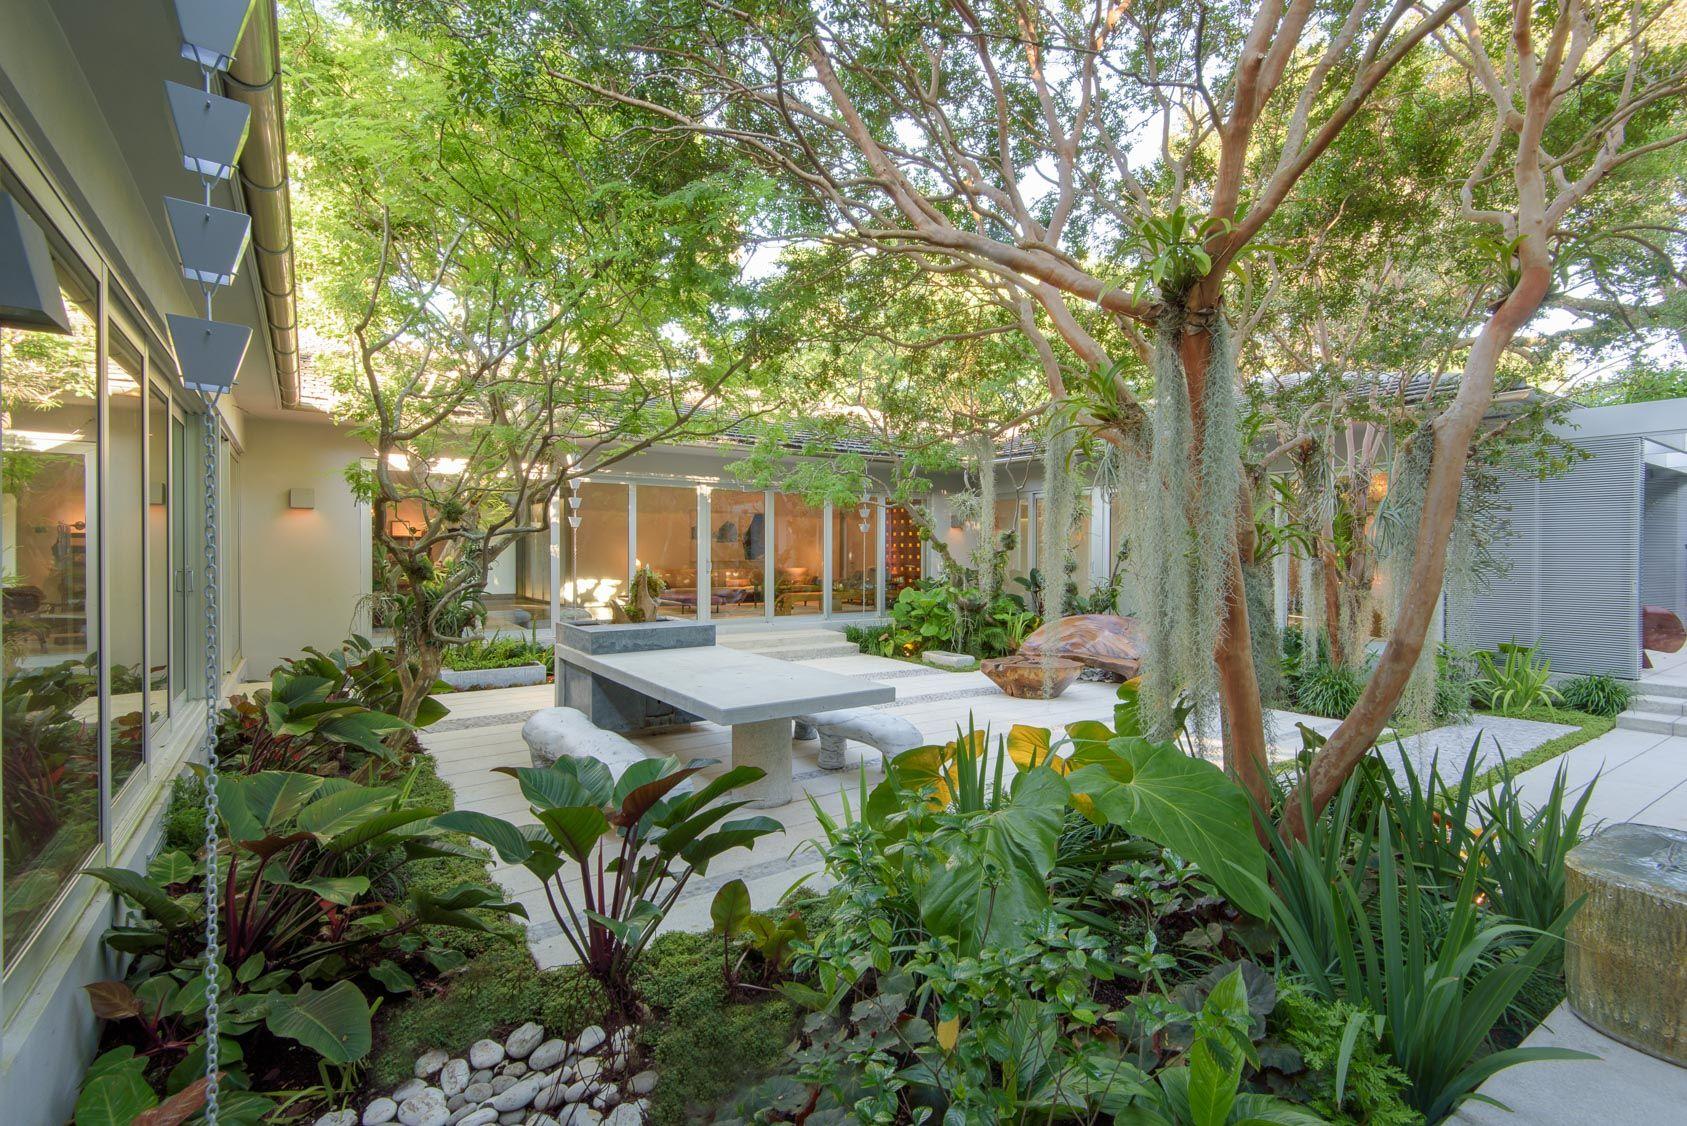 Miami Beach Residential Garden - Raymond Jungles. | Beautiful ...